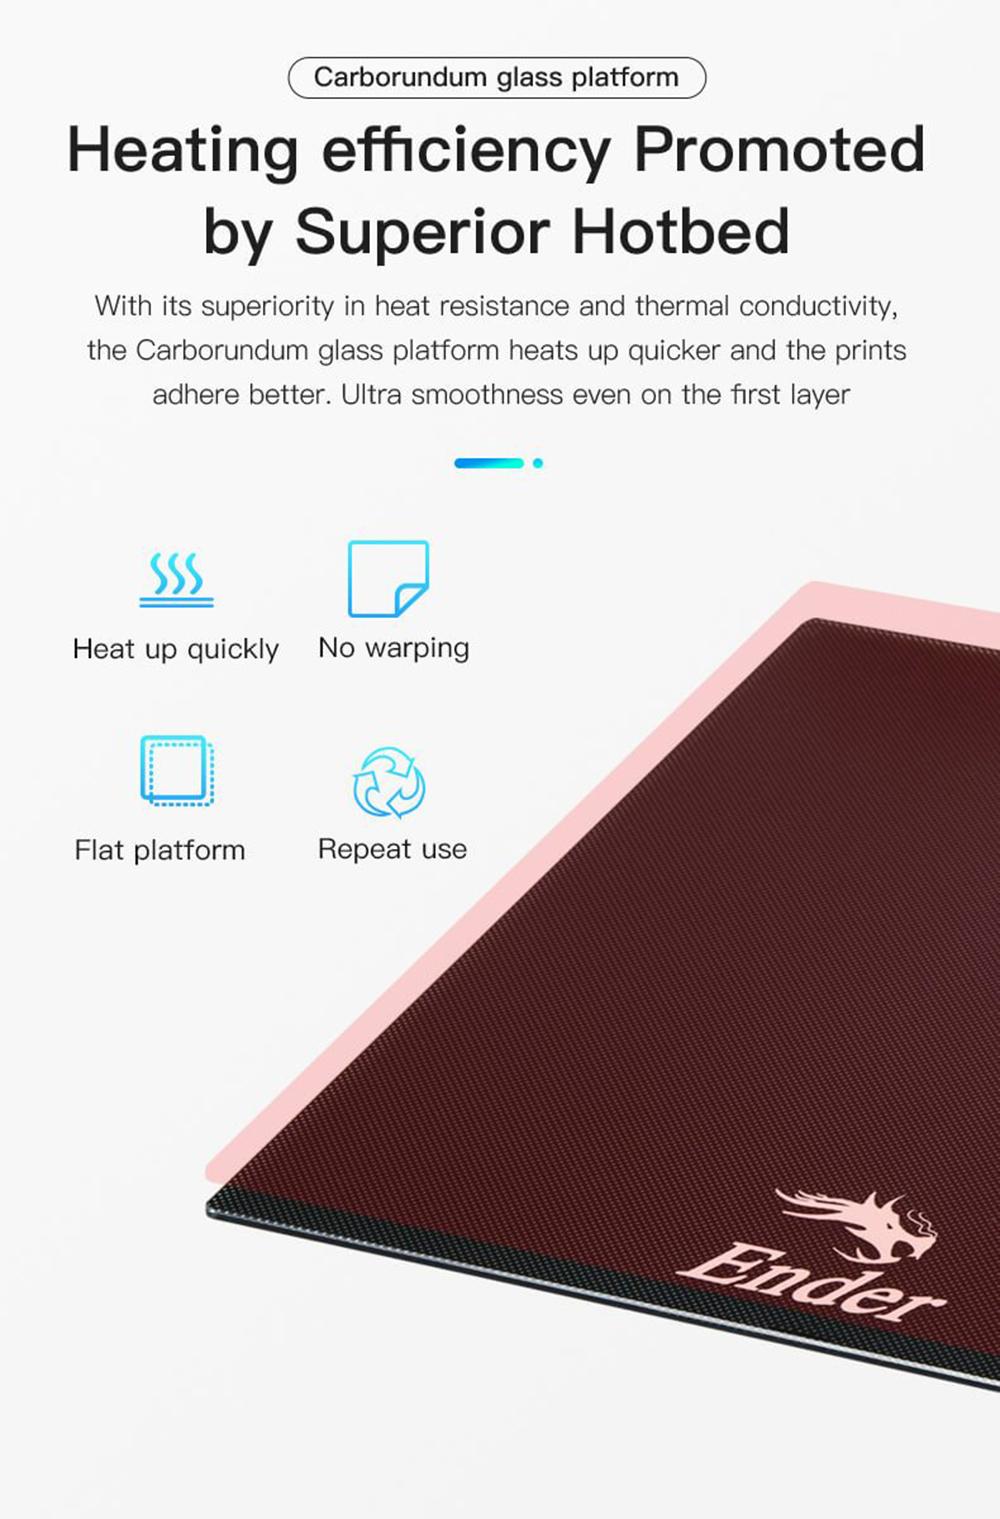 Creality3D Ender 6 3D-Drucker Bausatz - 250x250x400mm - Carborundum Glas Plattform